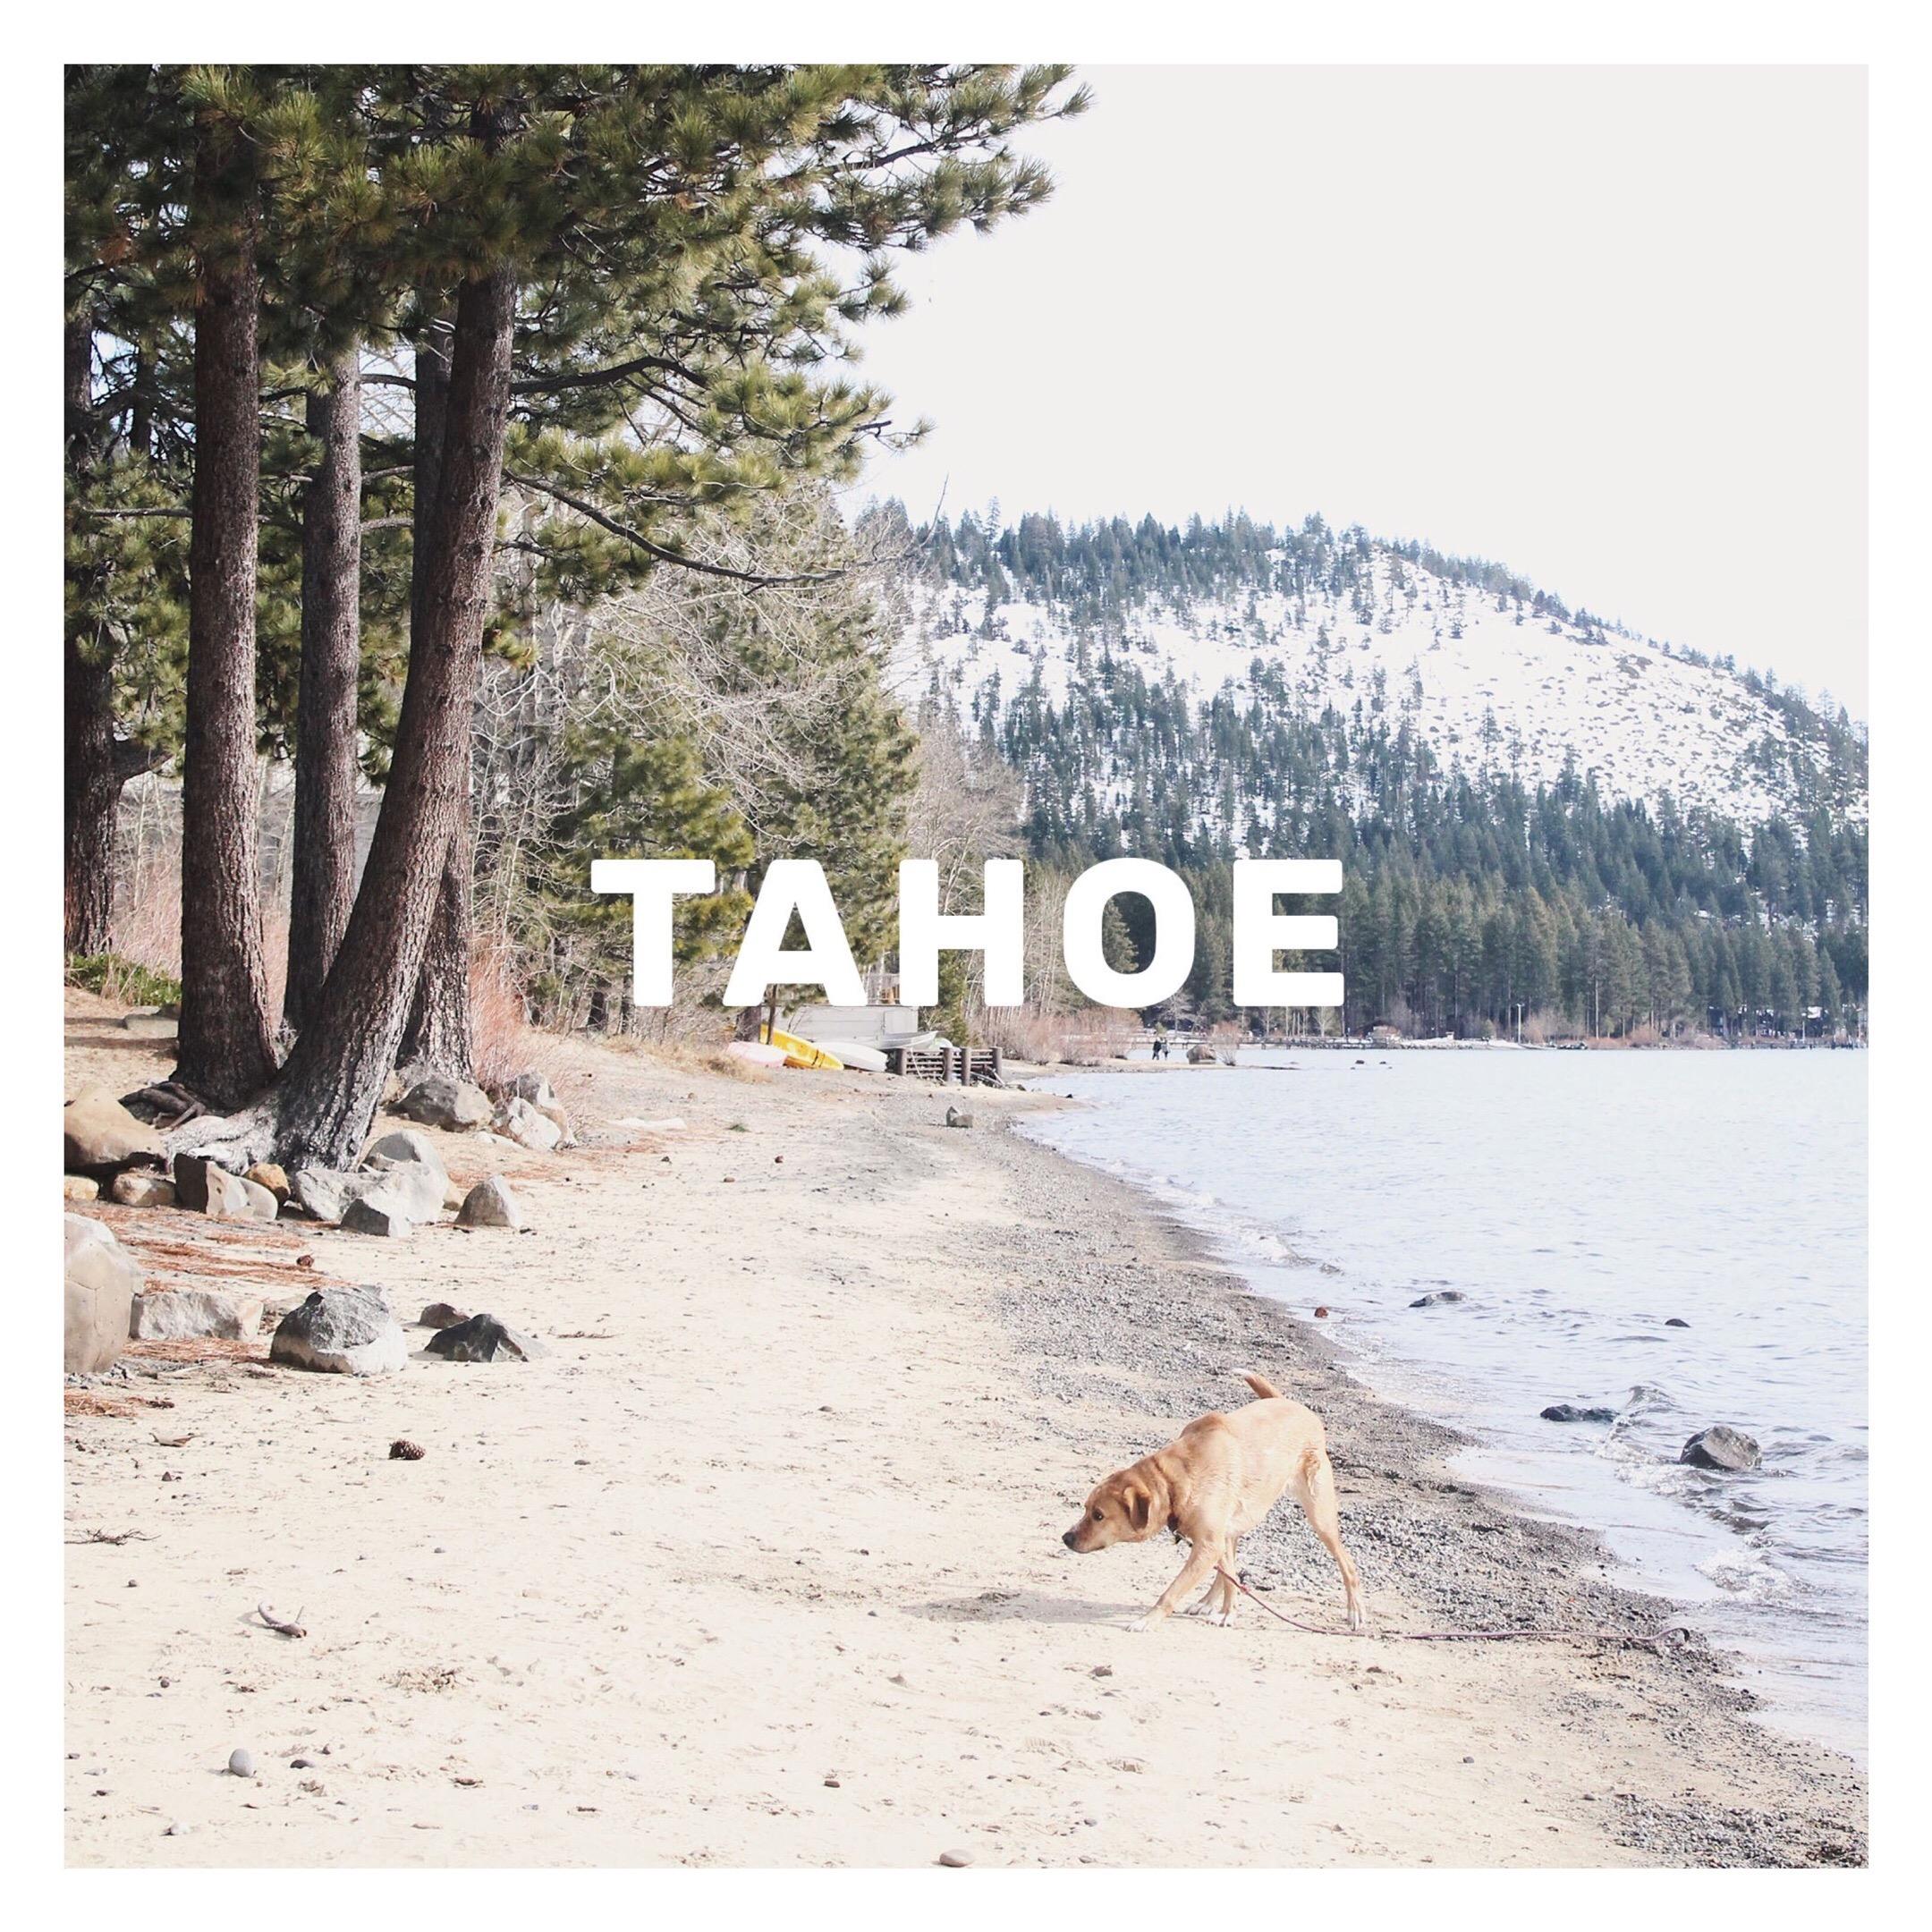 08 Tahoe - The Playlist.JPG